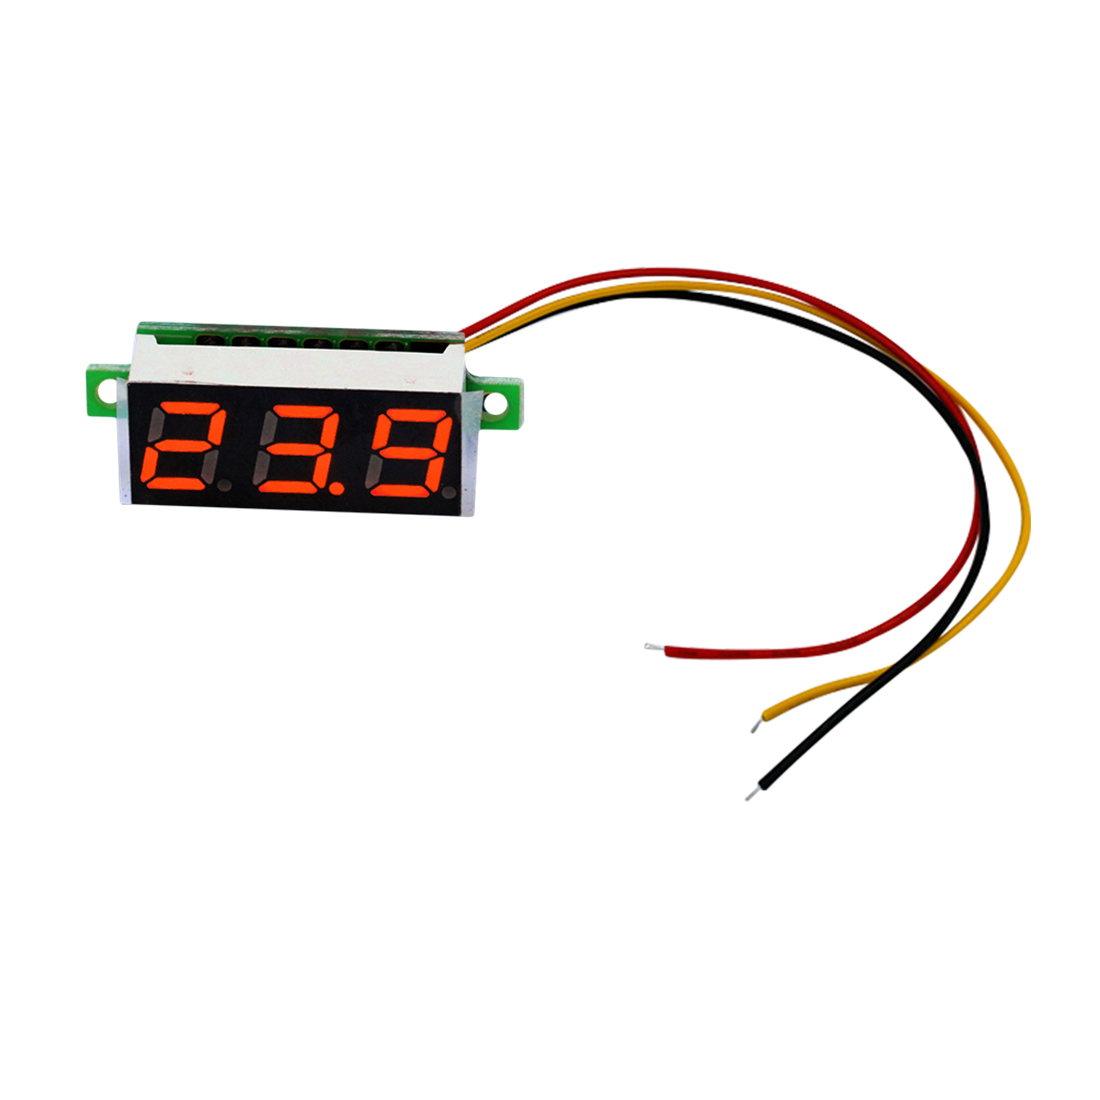 USB tester Charging tester Mini 0.36 inch DC 0-100v 3 bits Digital Red LED Display Panel Voltage Meter Voltmeter tester dc 6 100v red led digital display voltmeter mini voltage meter volt tester panel for dc 12v cars motorcycles vehicles